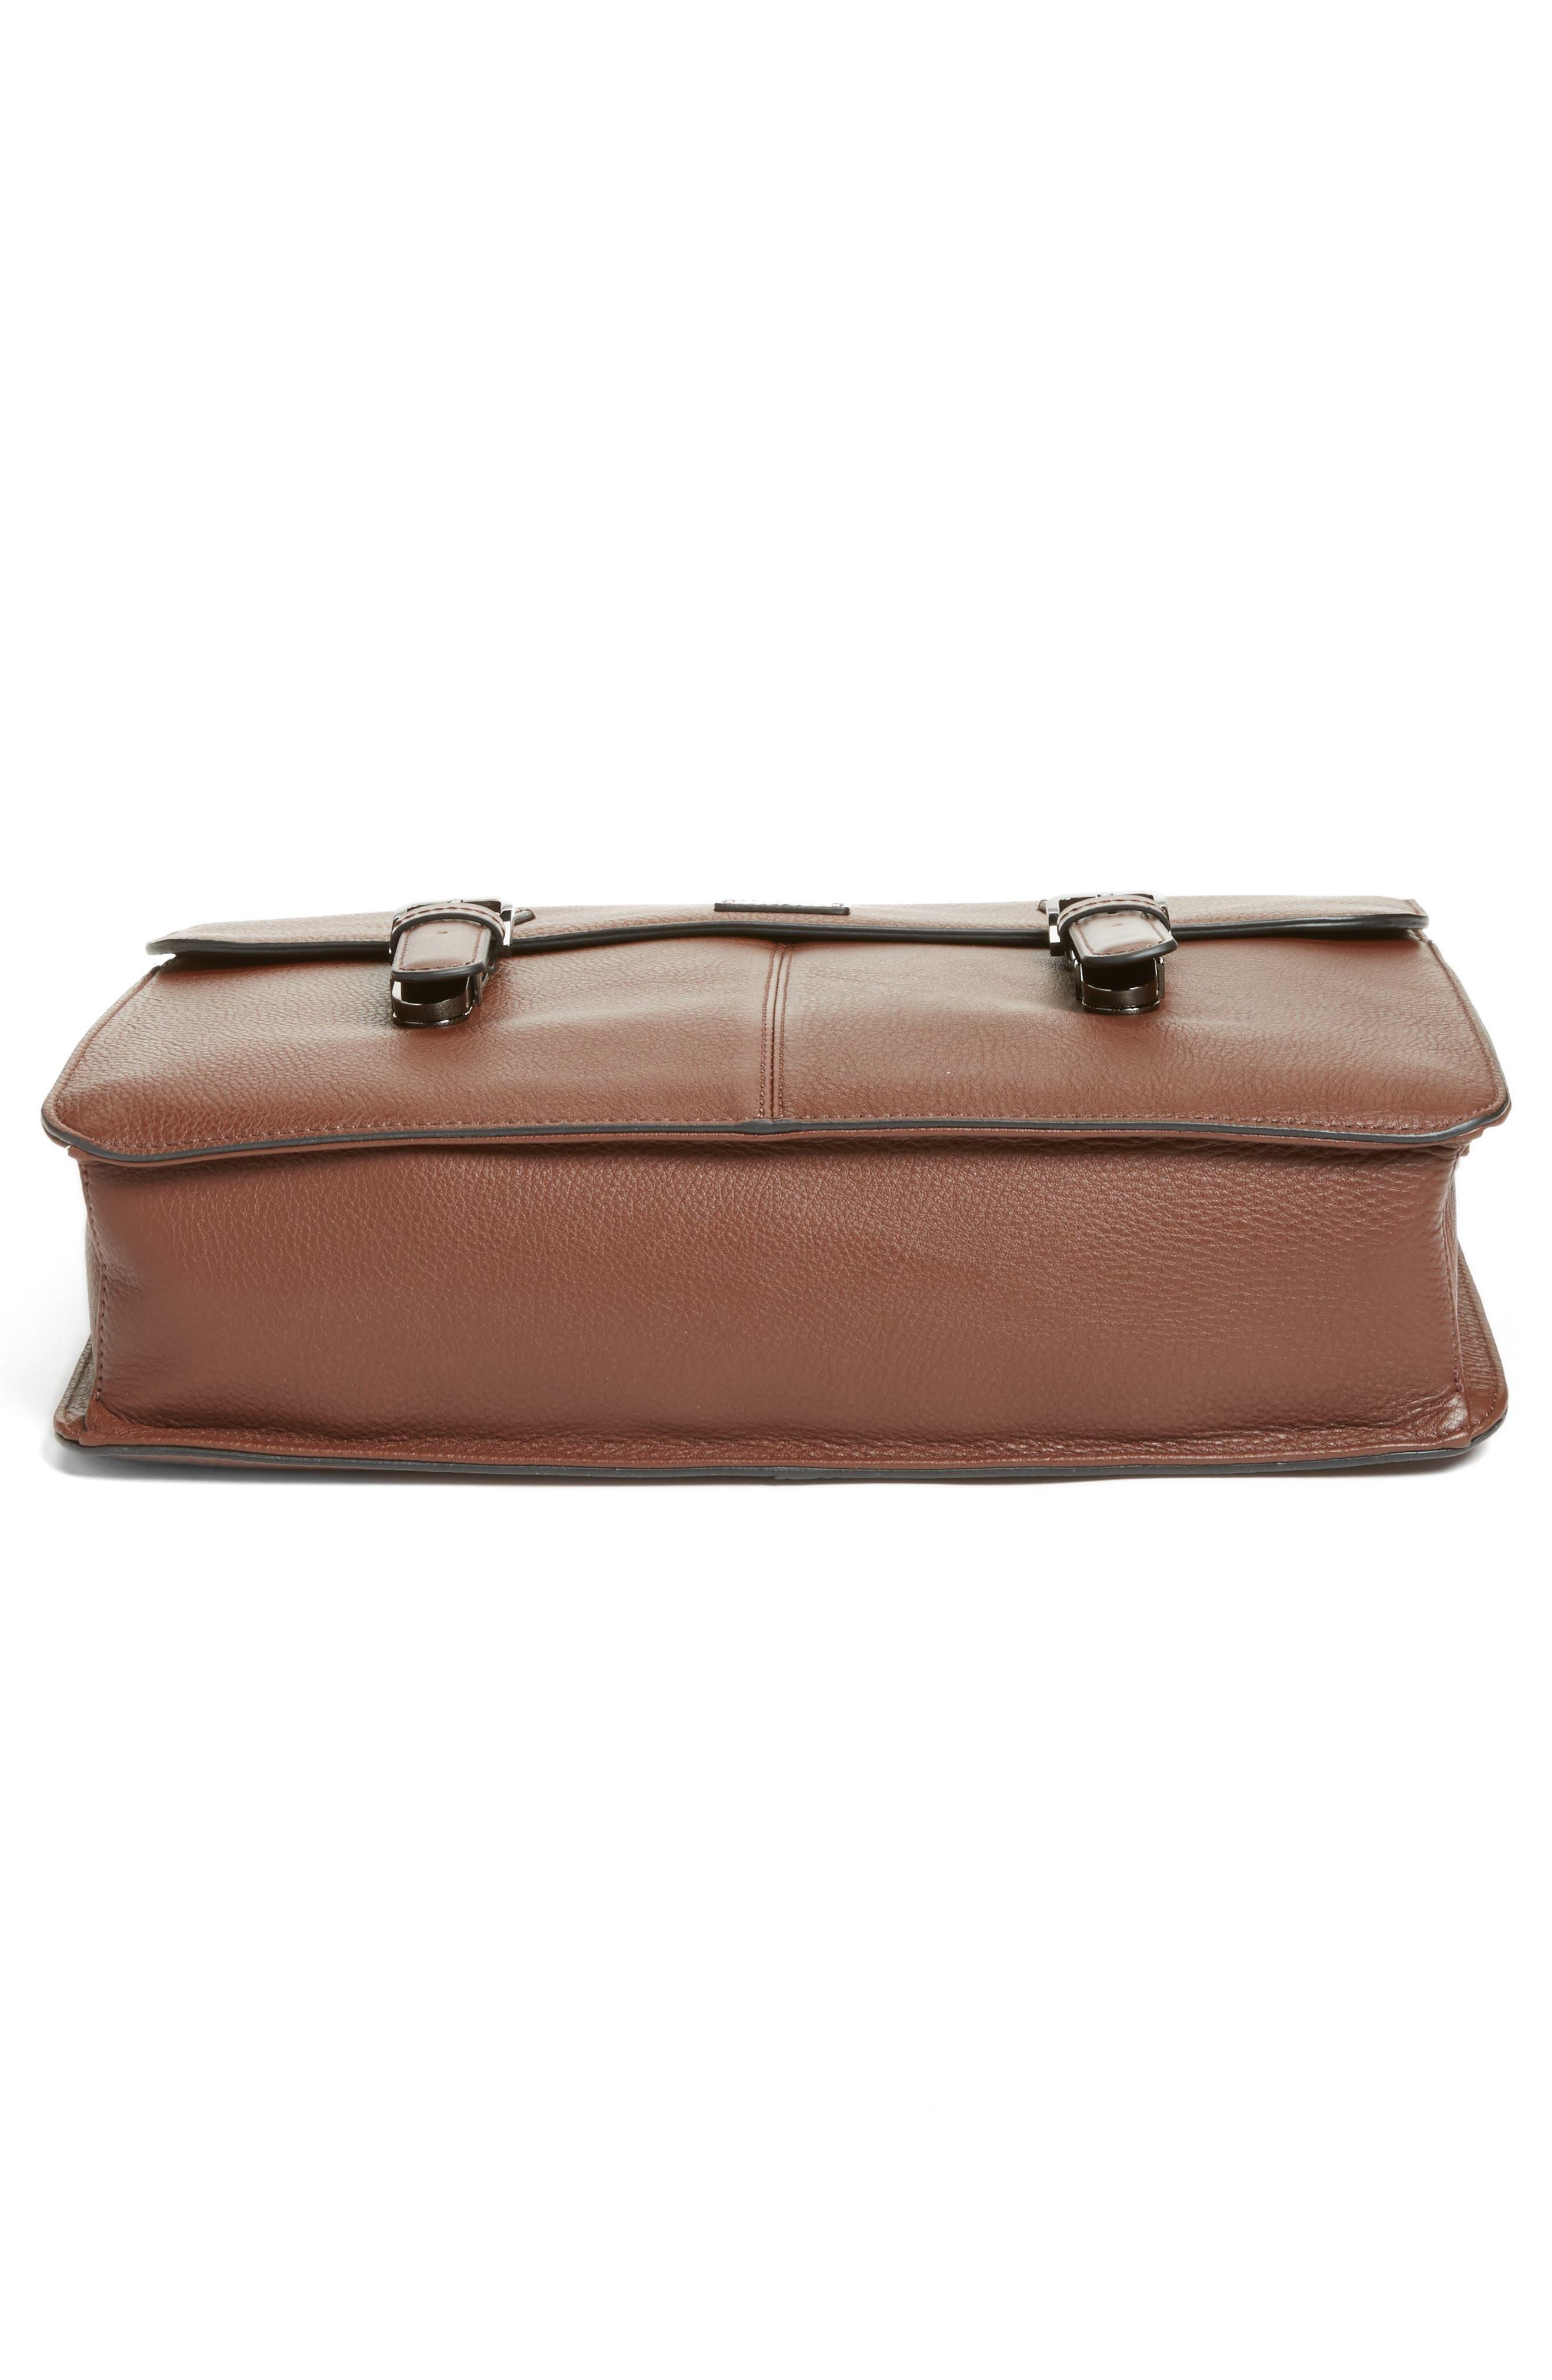 Bengal Leather Satchel,                             Alternate thumbnail 12, color,